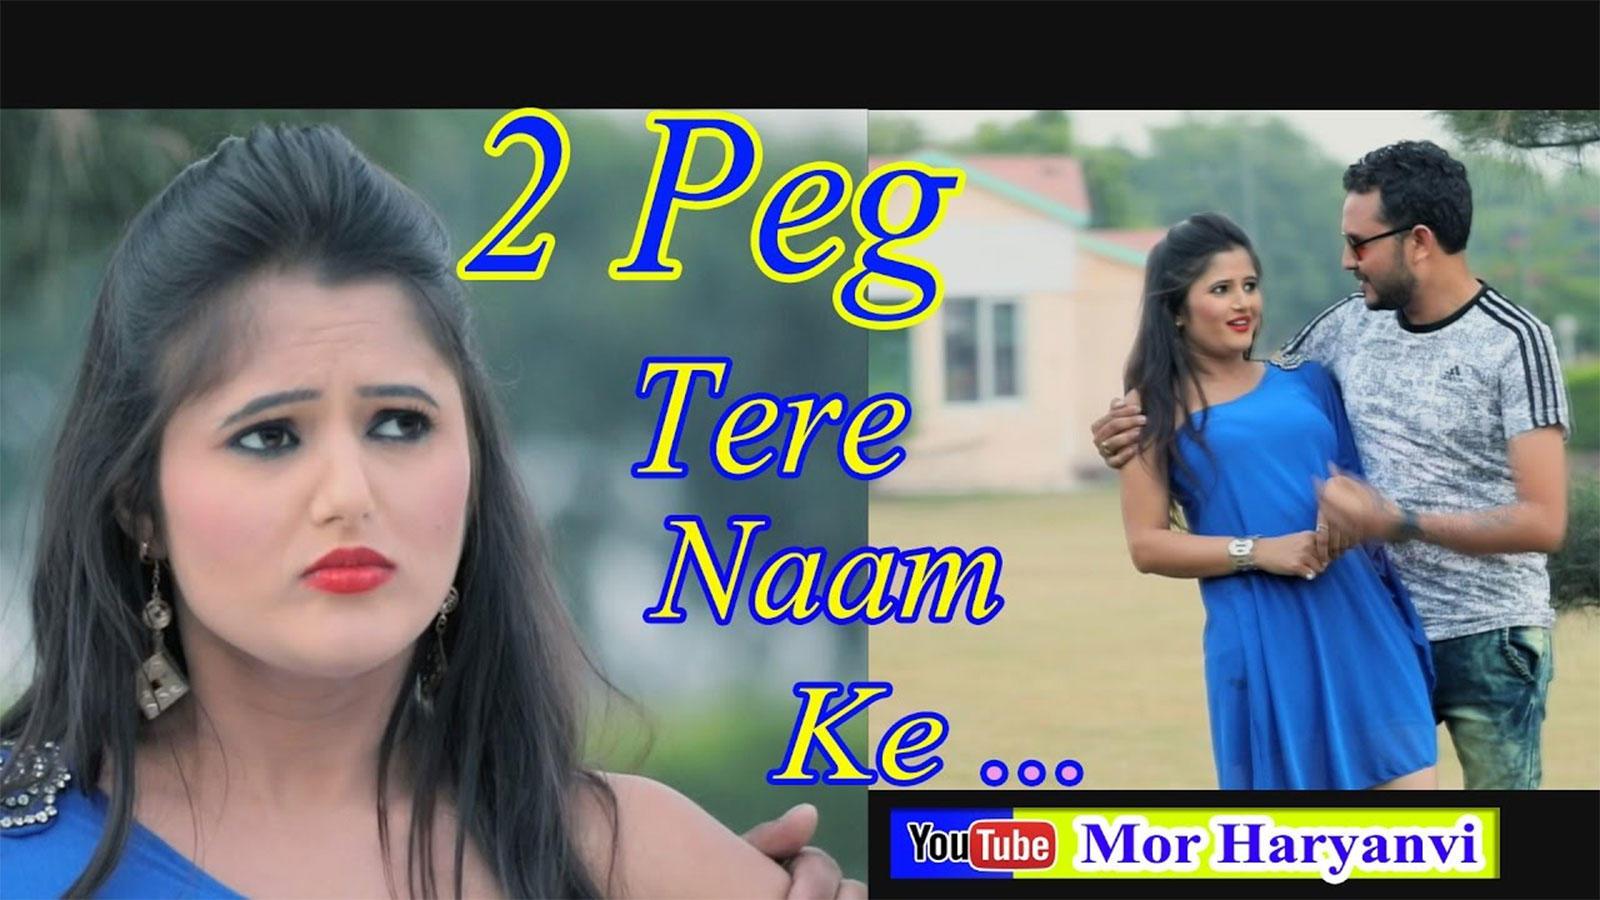 Haryanvi Gana New Video Songs Geet: Haryanvi Song '2 Peg Tere Naam Ke' Sung  by Anjali Raghav & Sanju Khewriya